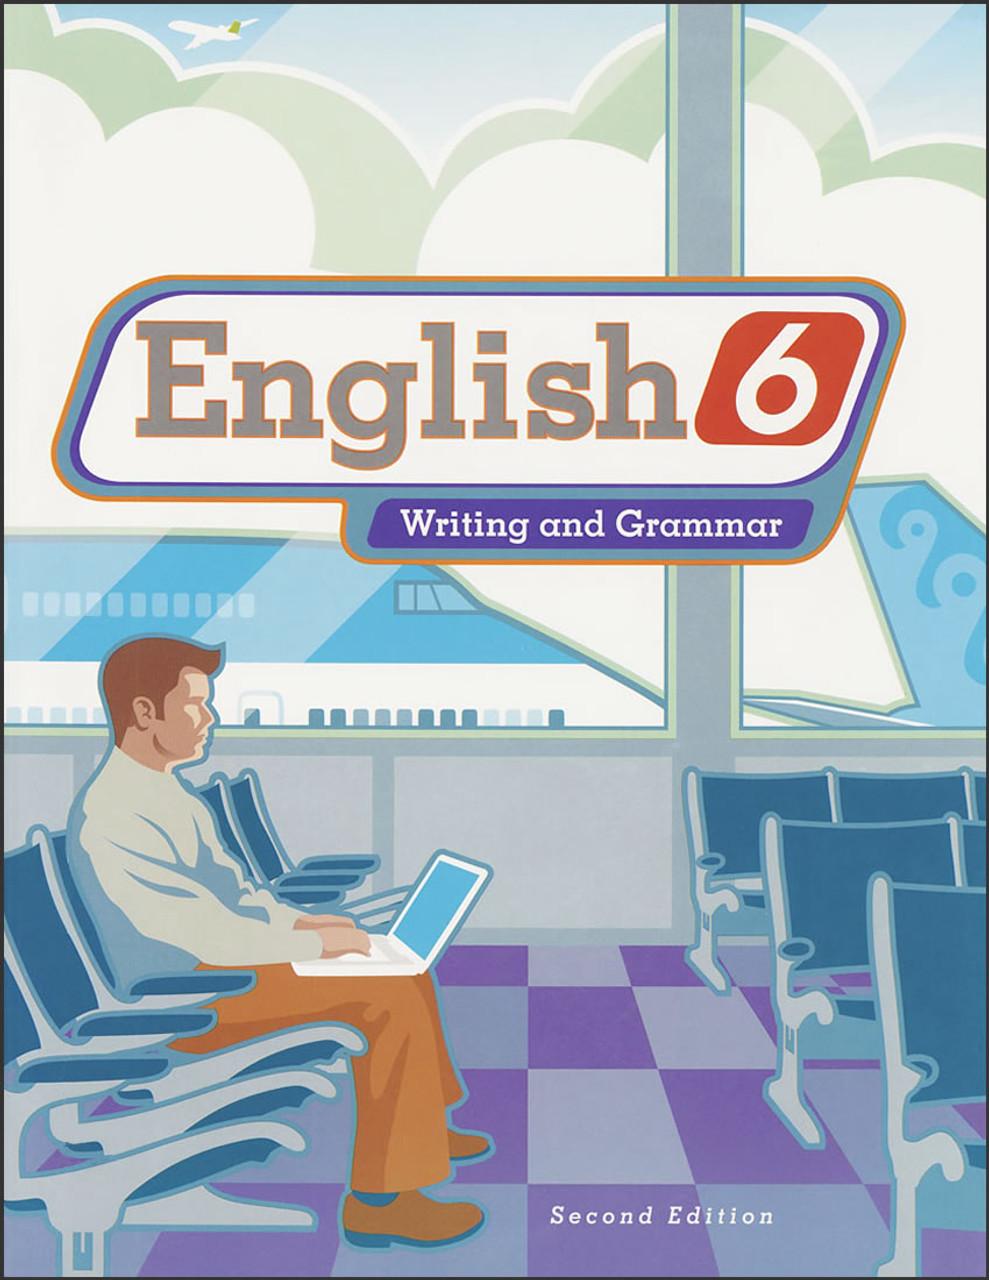 English 6: Writing and Grammar, 2nd edition